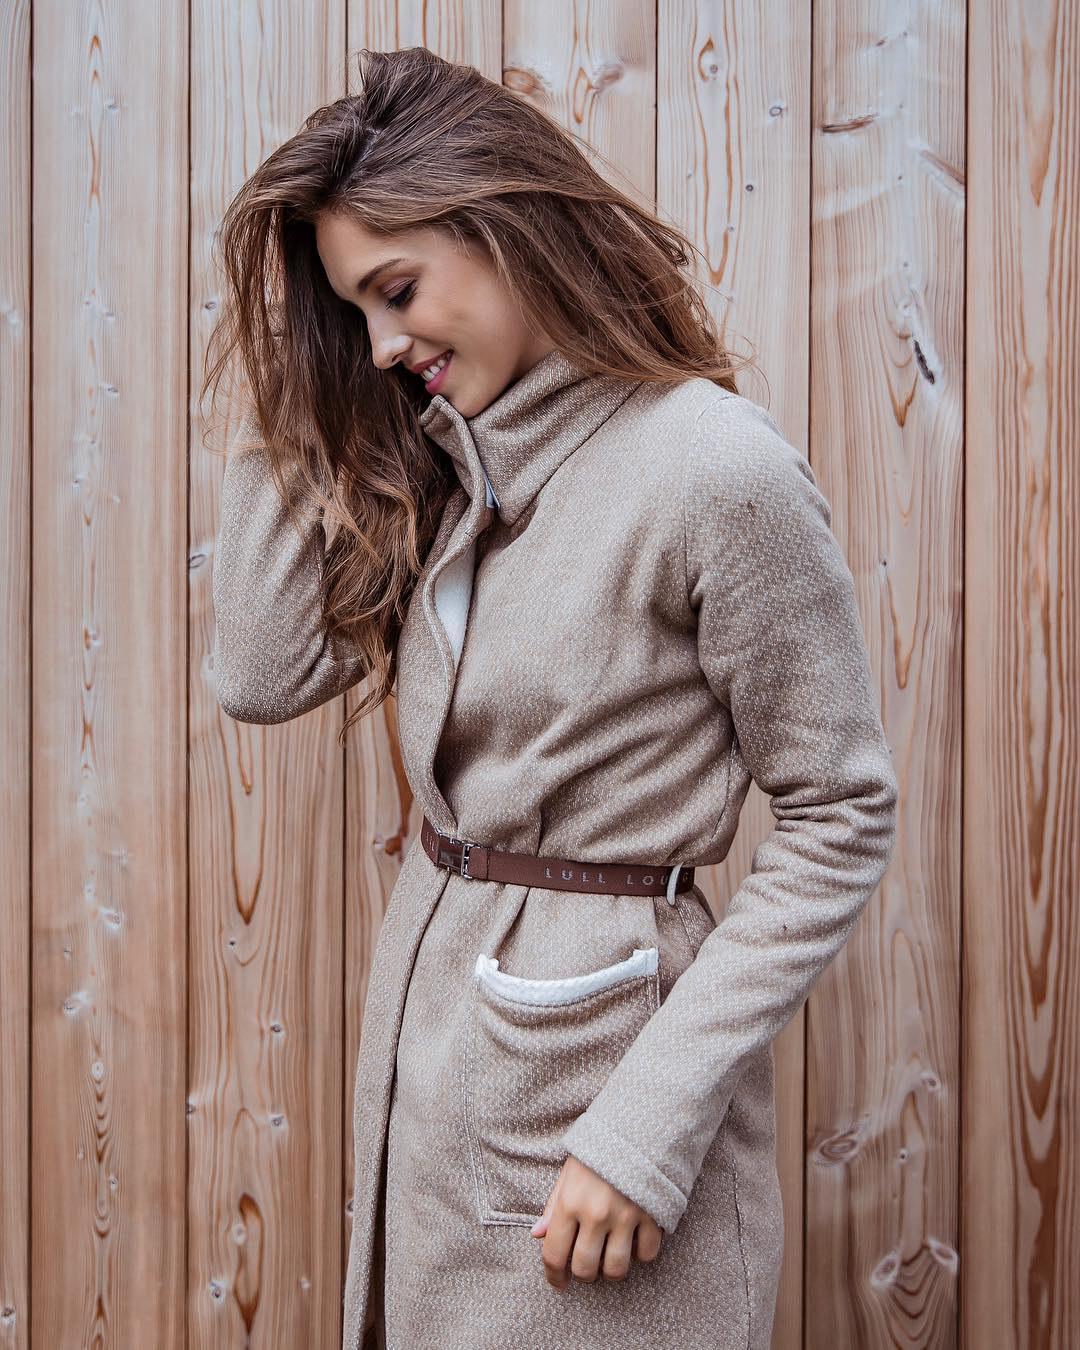 Model Rita